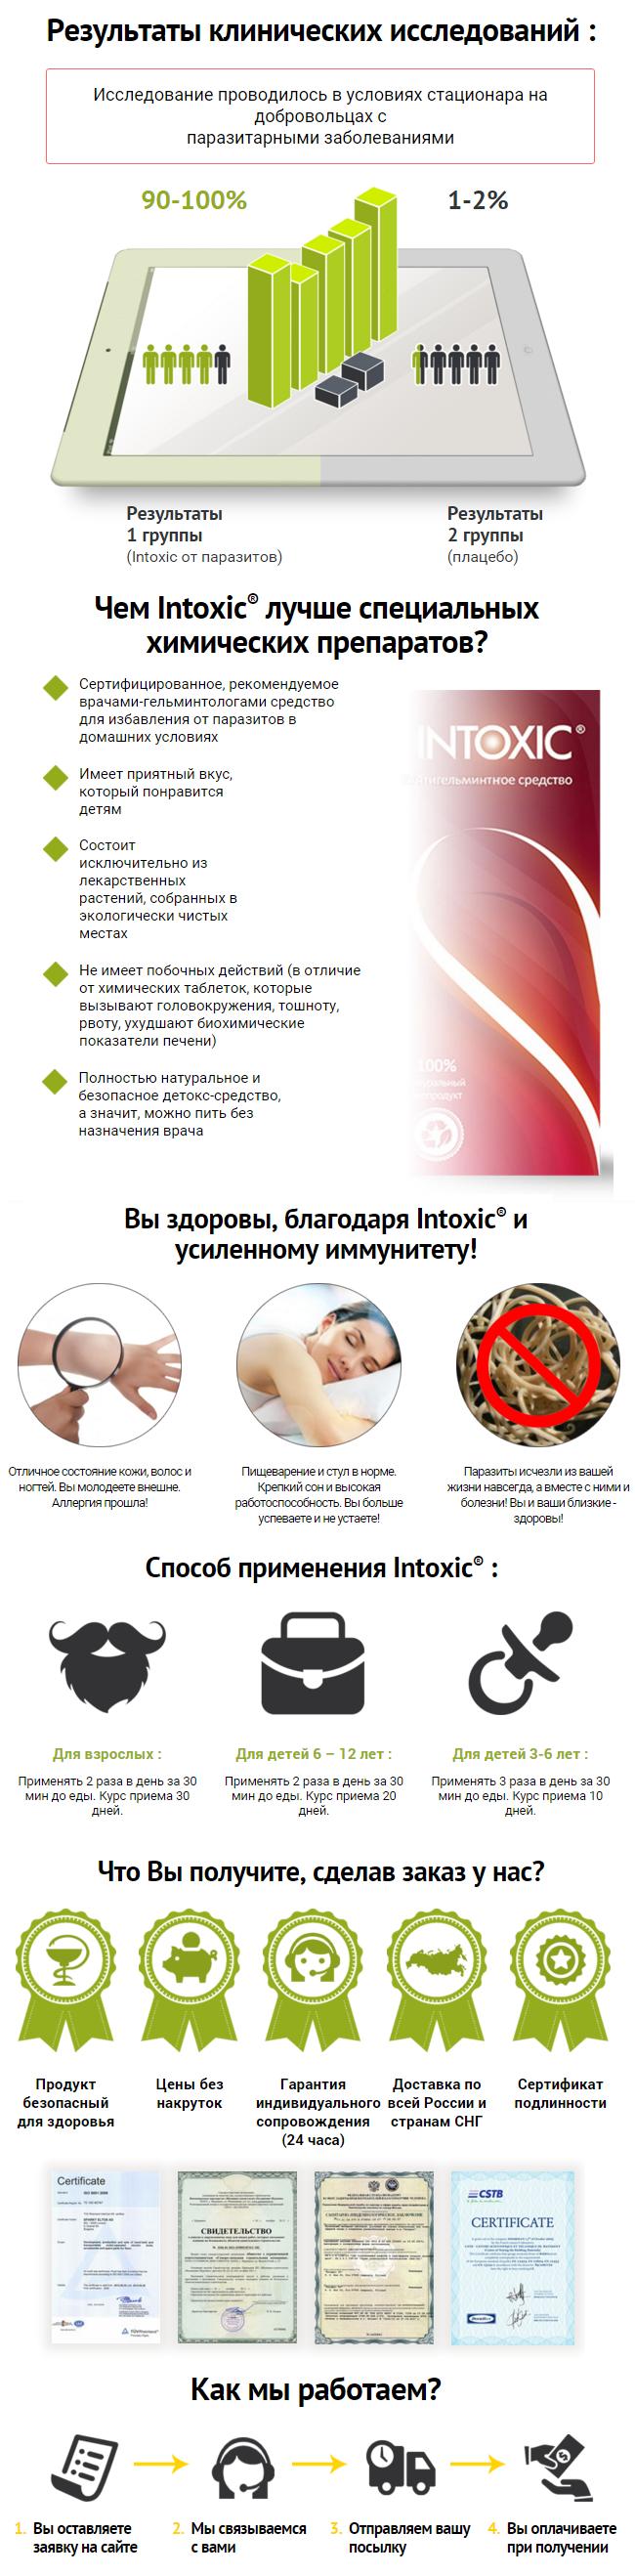 Антипаразитарное средство Intoxic - фото 2